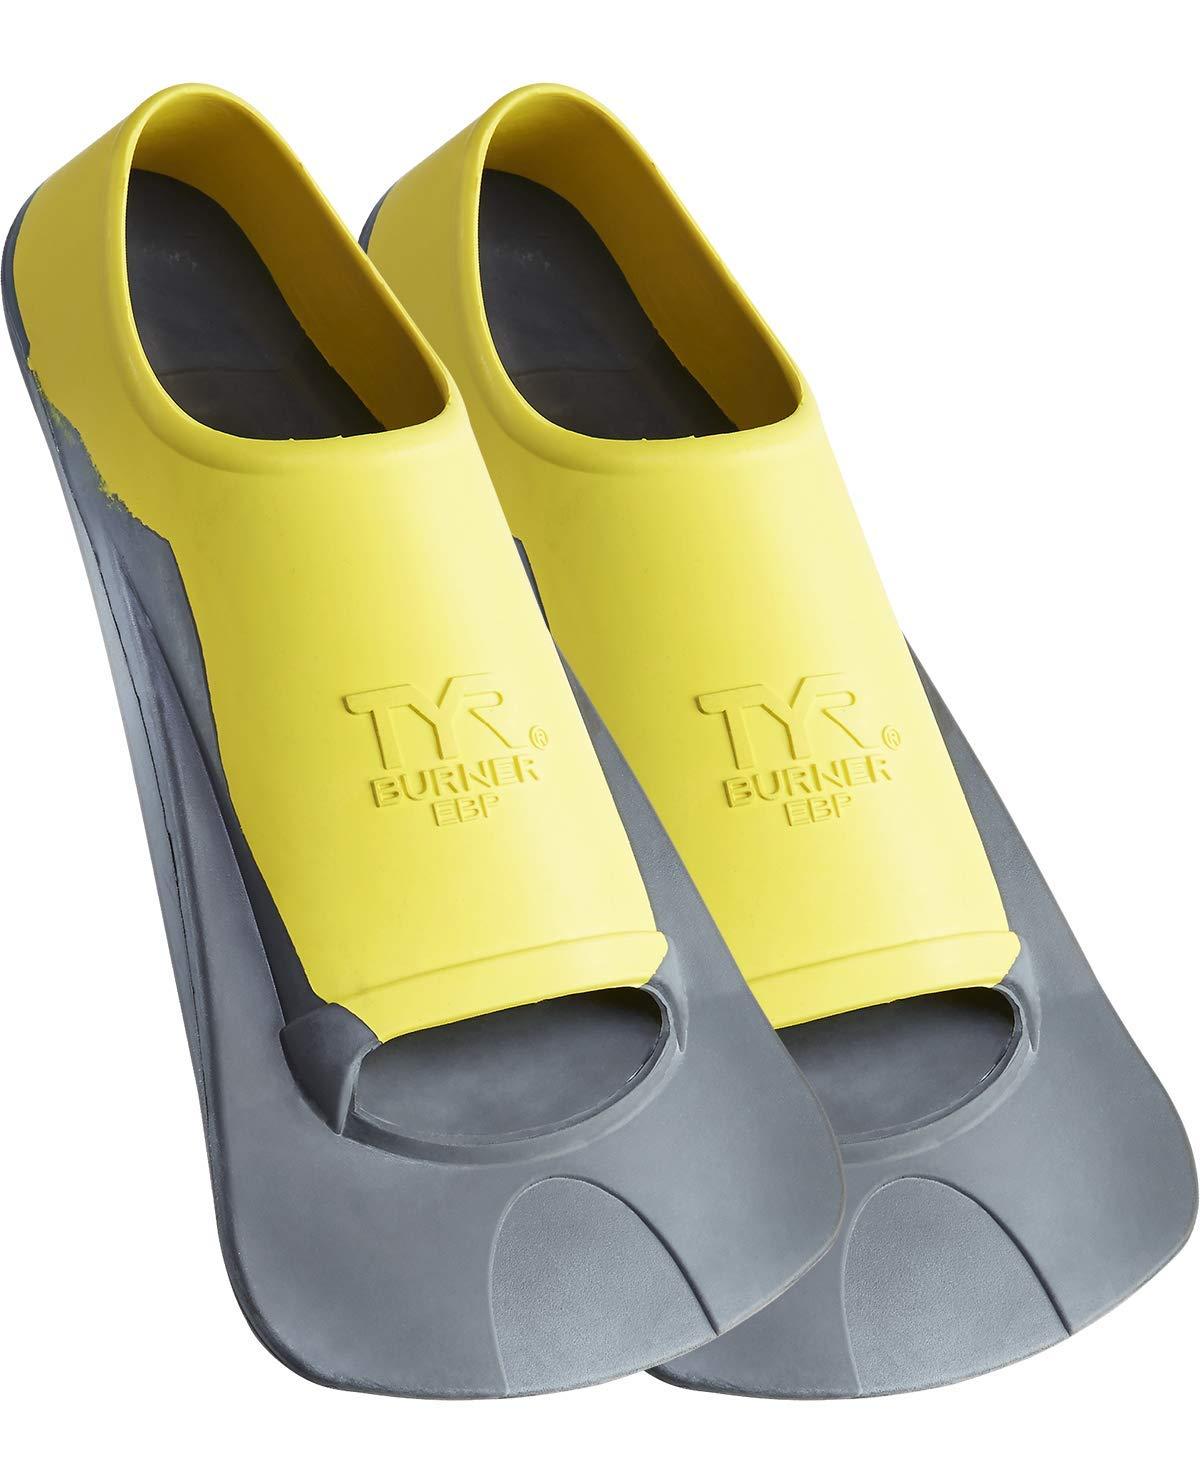 TYR SPORT EBP Burner Fin, Medium, Yellow/Black